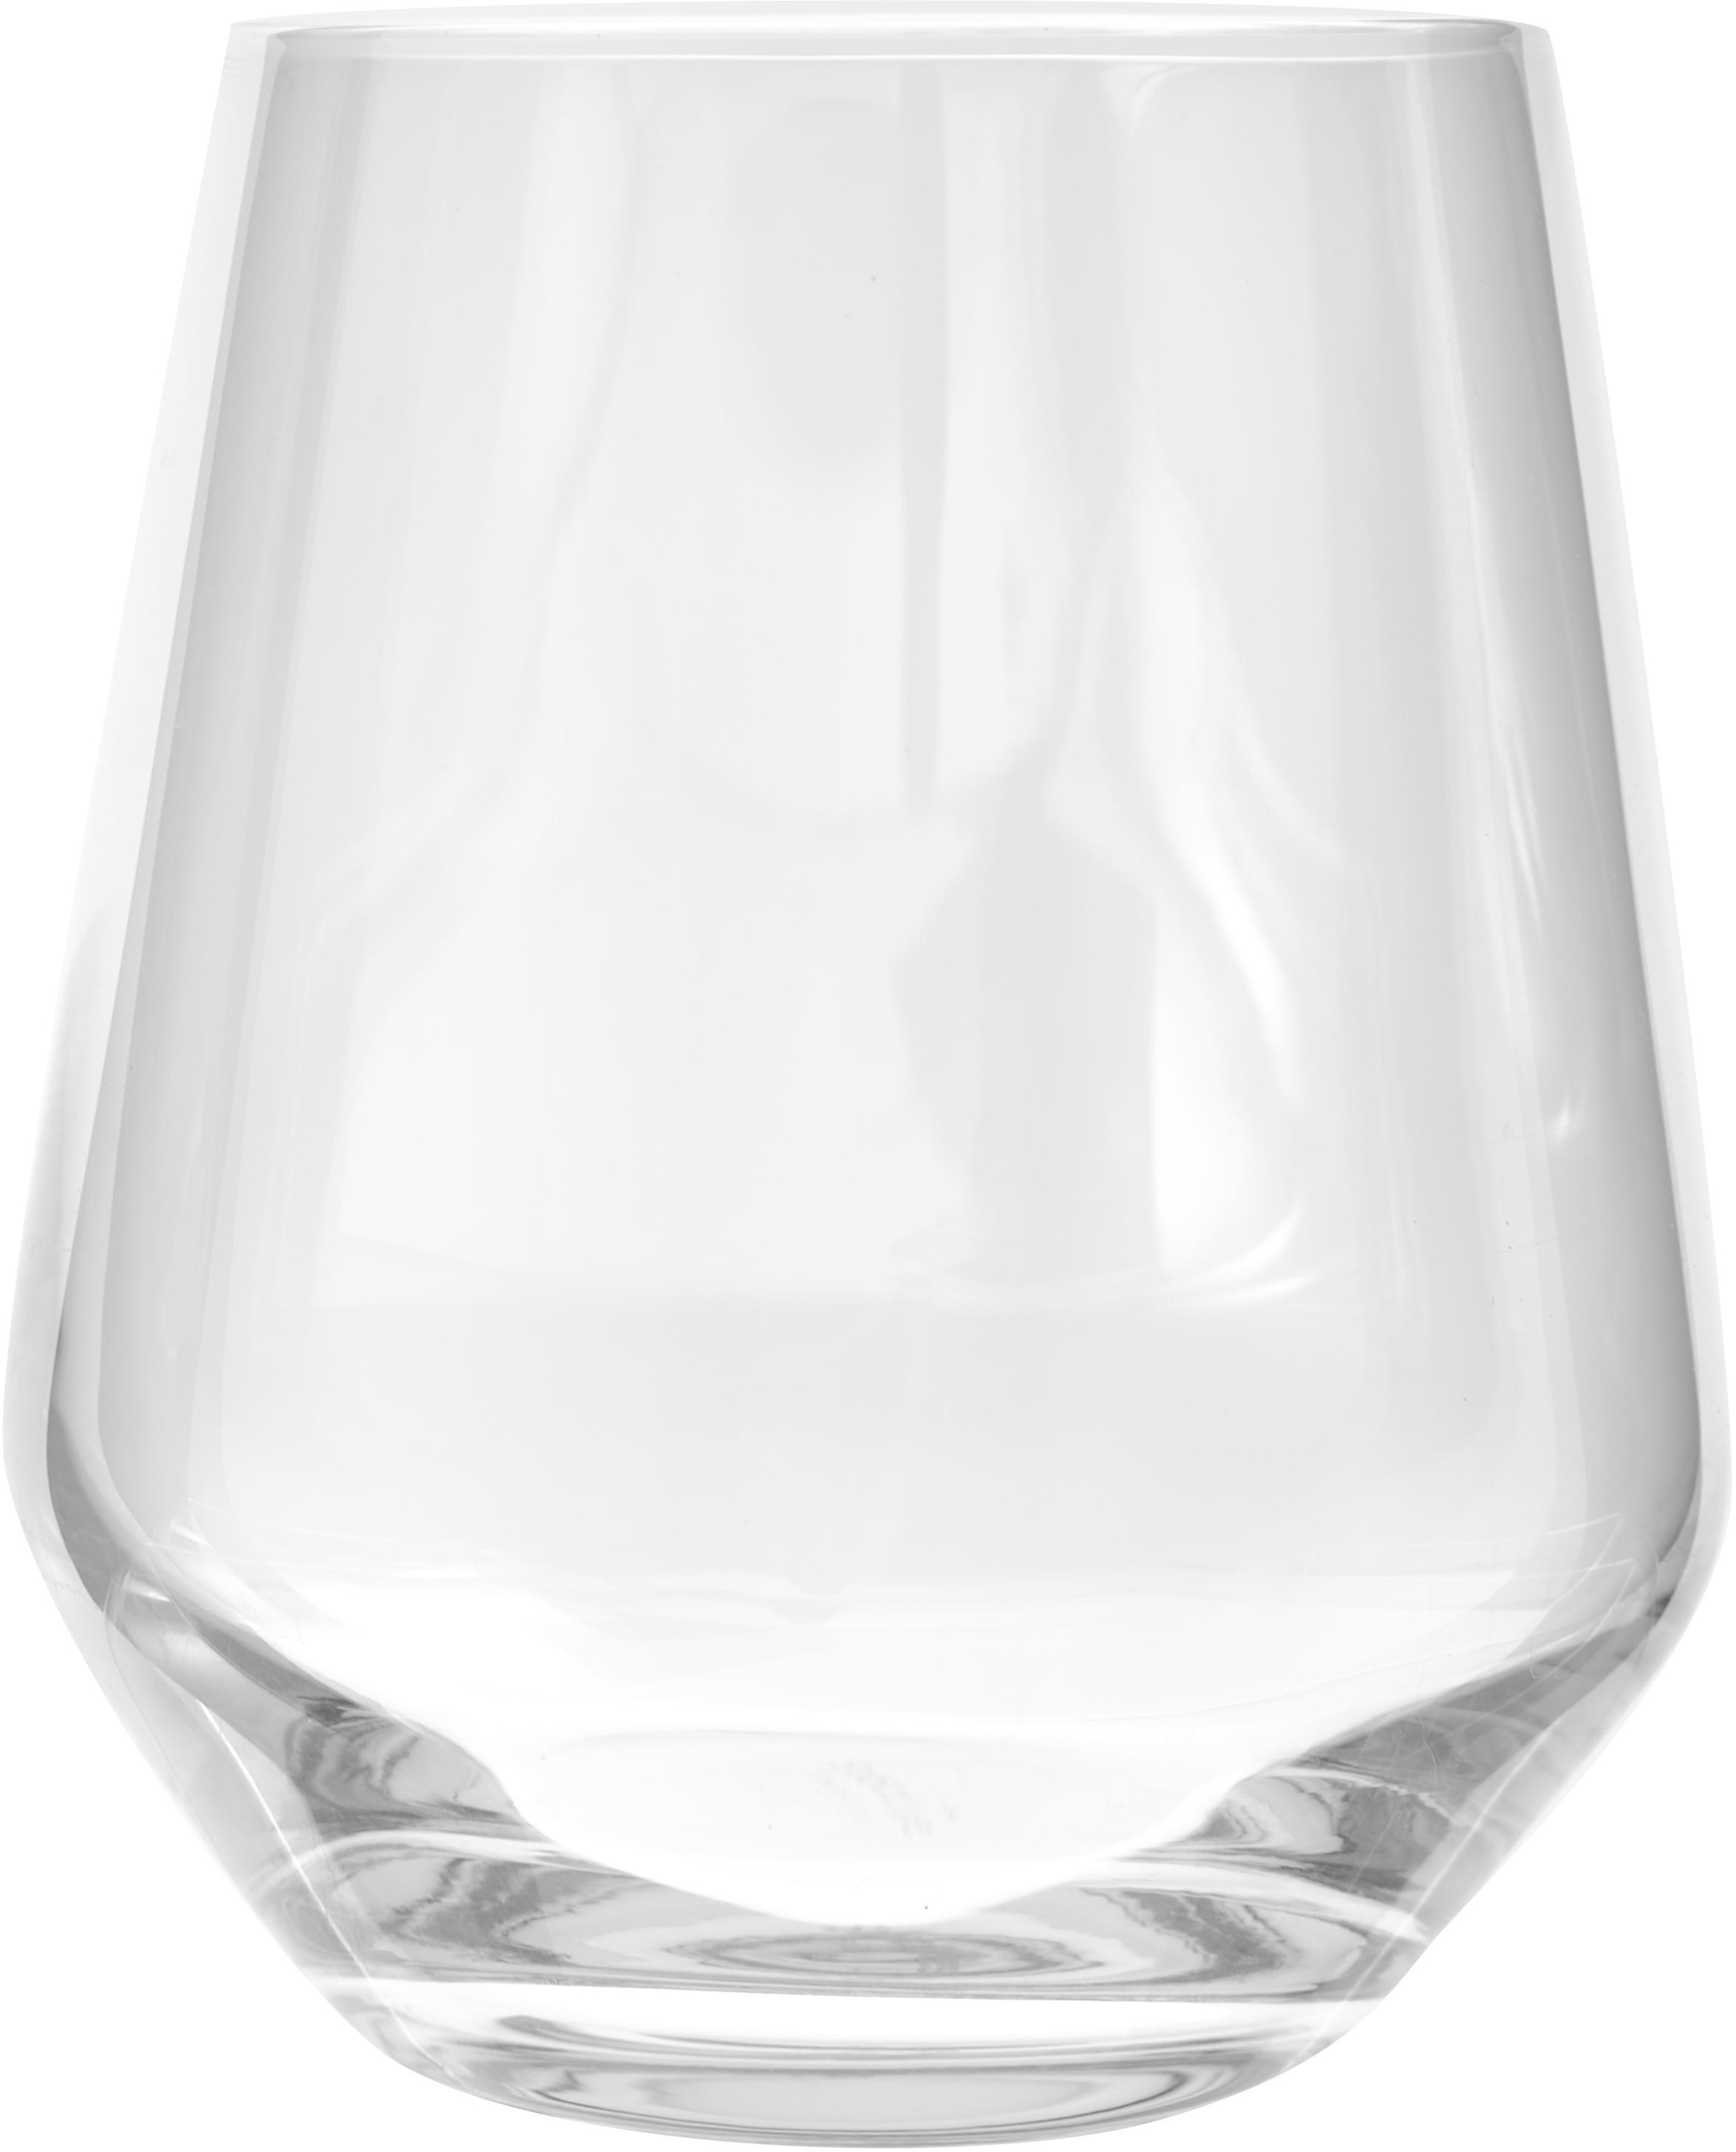 Vasos de cristal Revolution, 6uds., Cristal, Transparente, Ø 9 x Al 11 cm